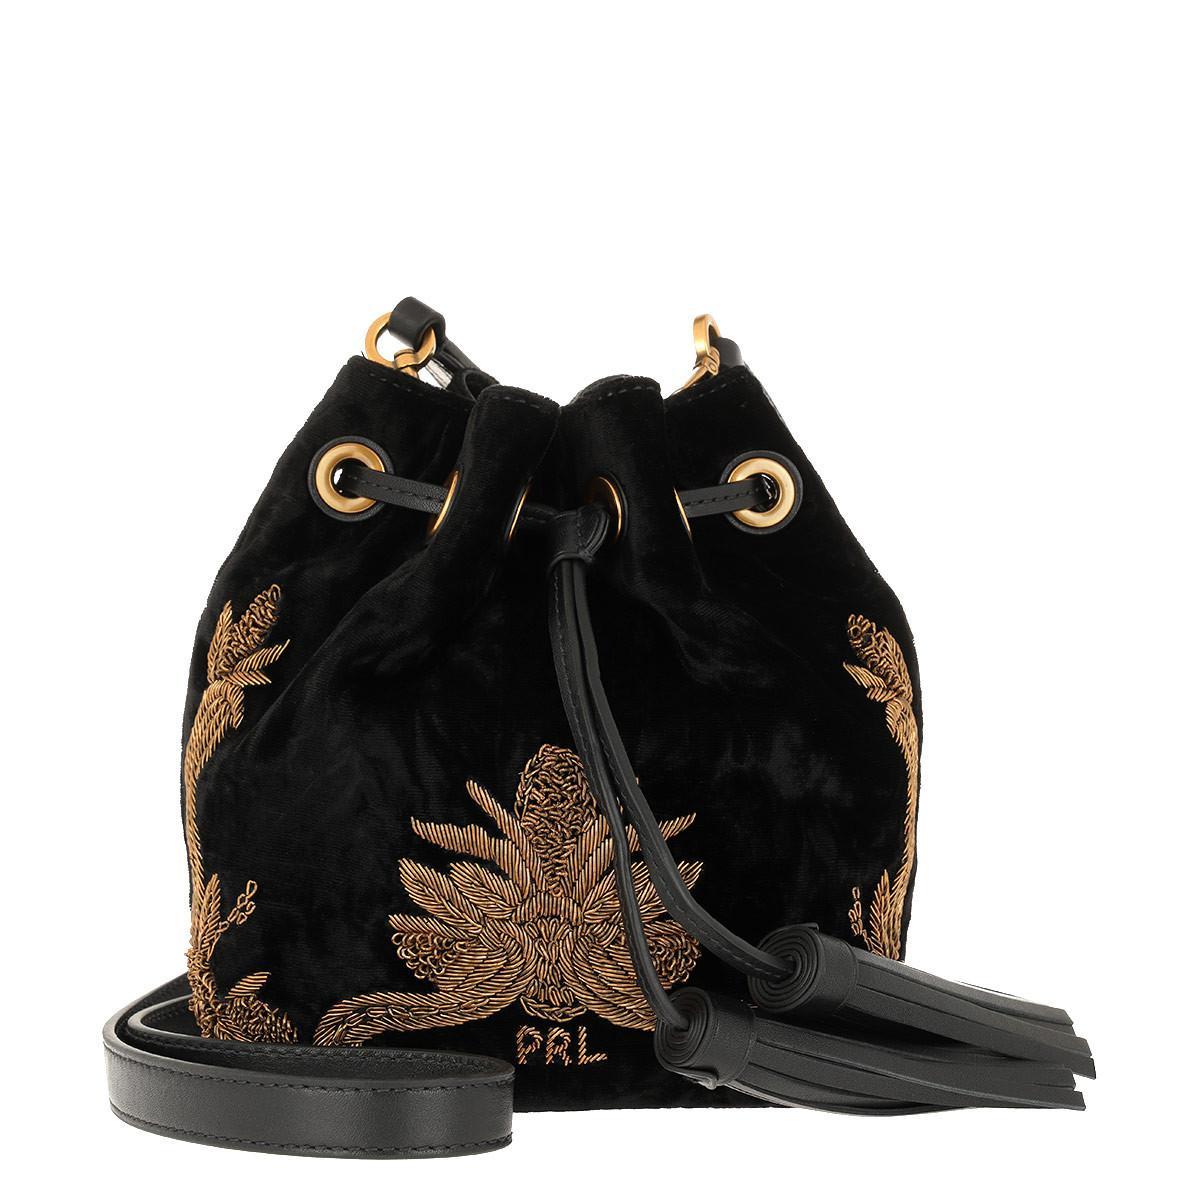 Polo Ralph Lauren. Women s Brooke Sm Drawstring Crossbody Bag Small Black 5c8d498b60ec5